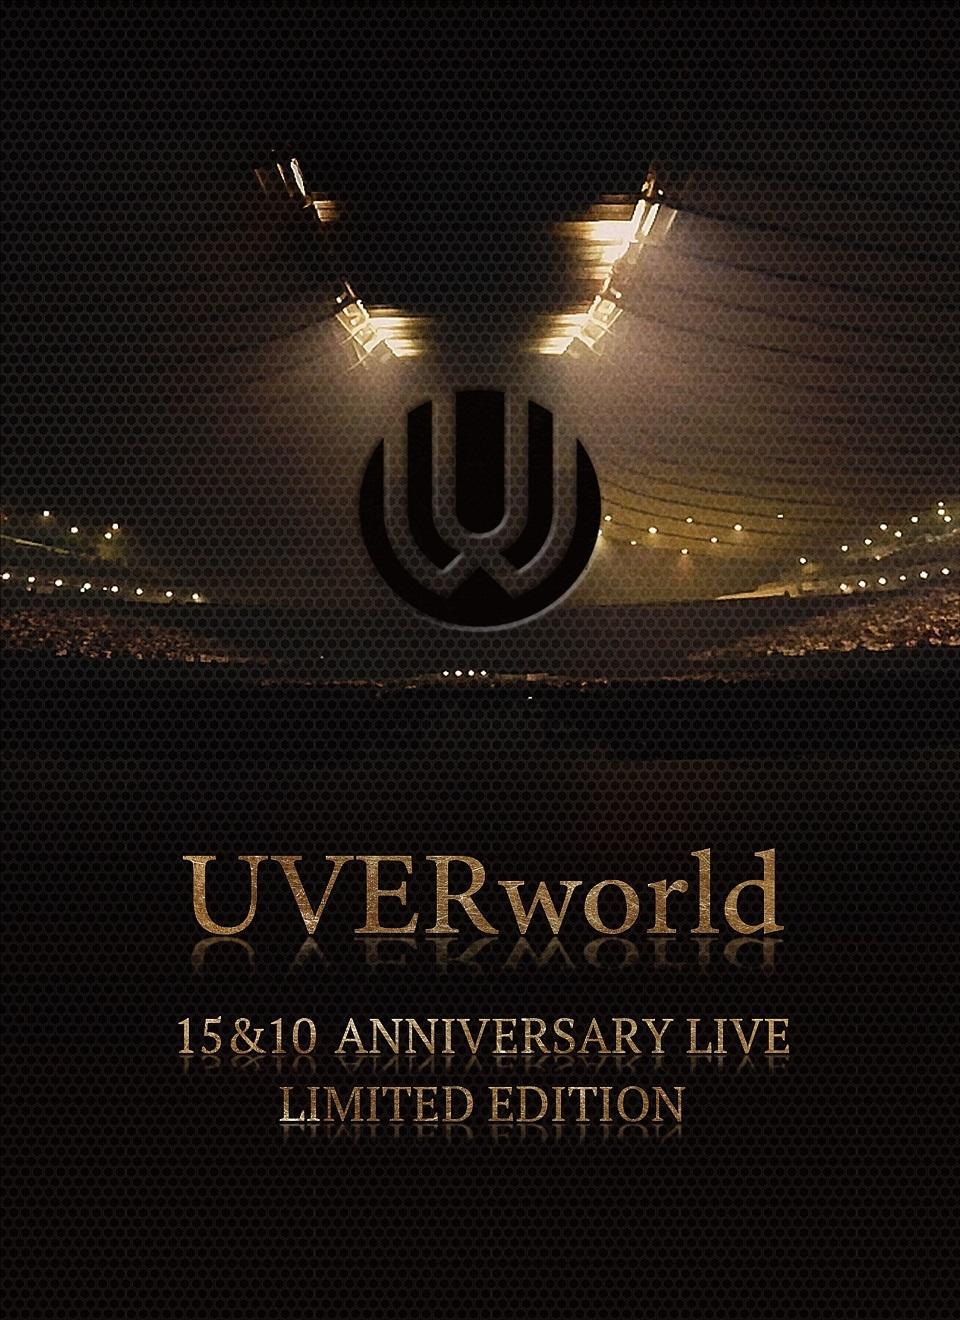 UVERworld 15&10 Anniversary Live LIMITED EDITION